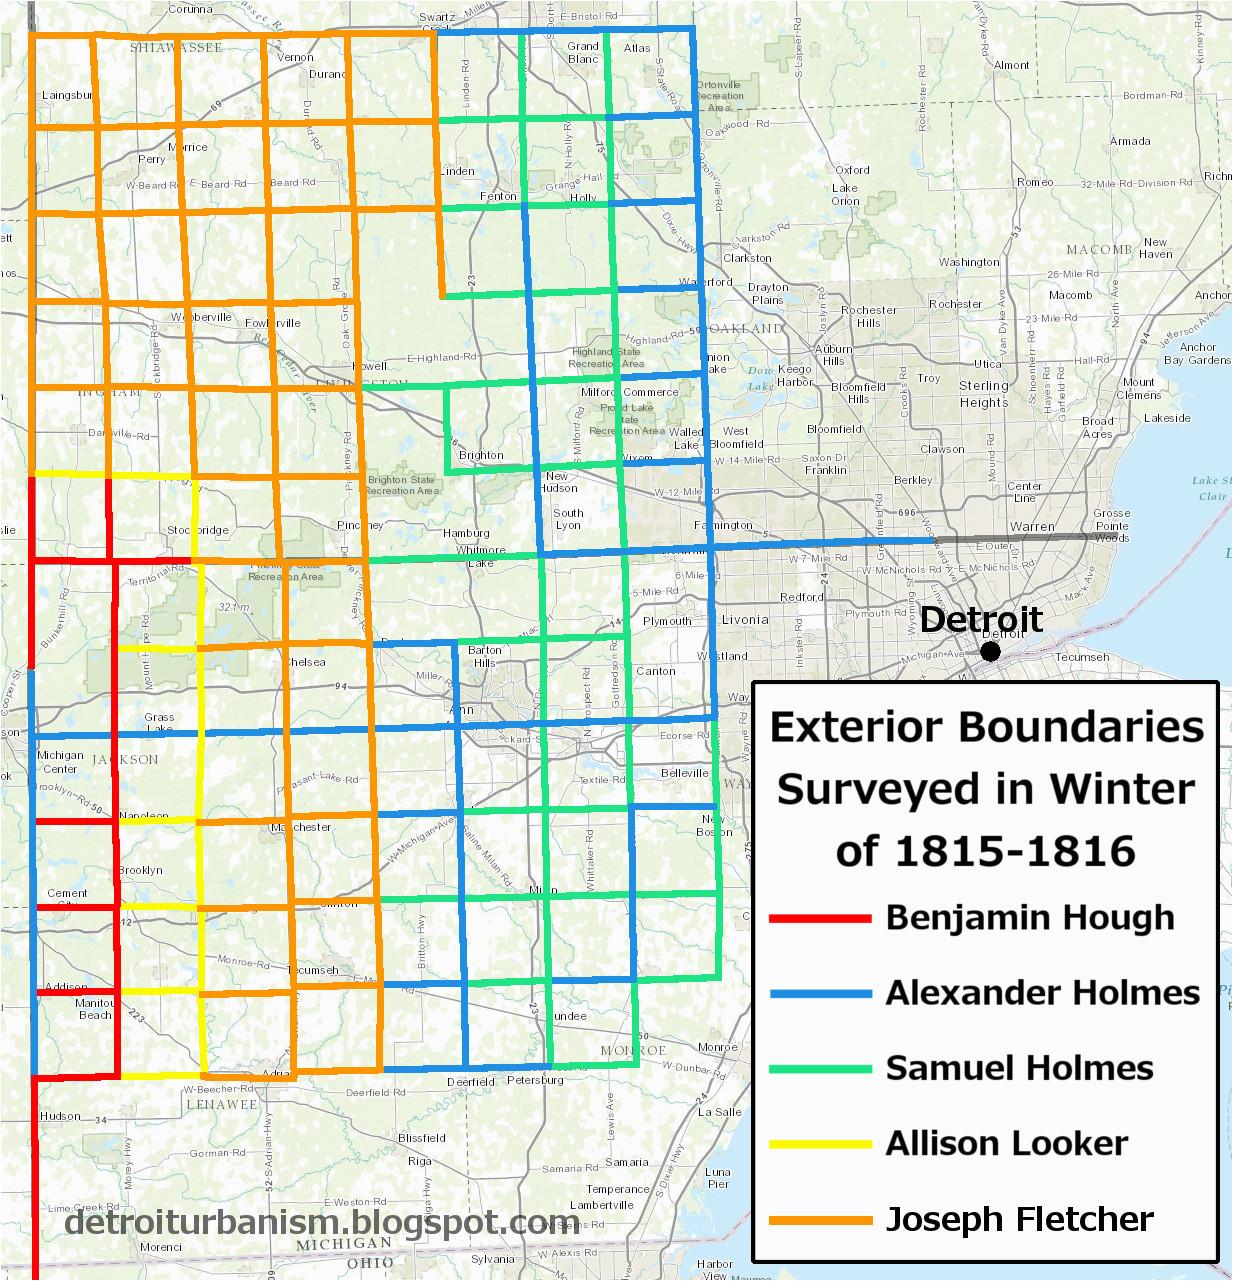 detroit urbanism the grid part i the survey of michigan